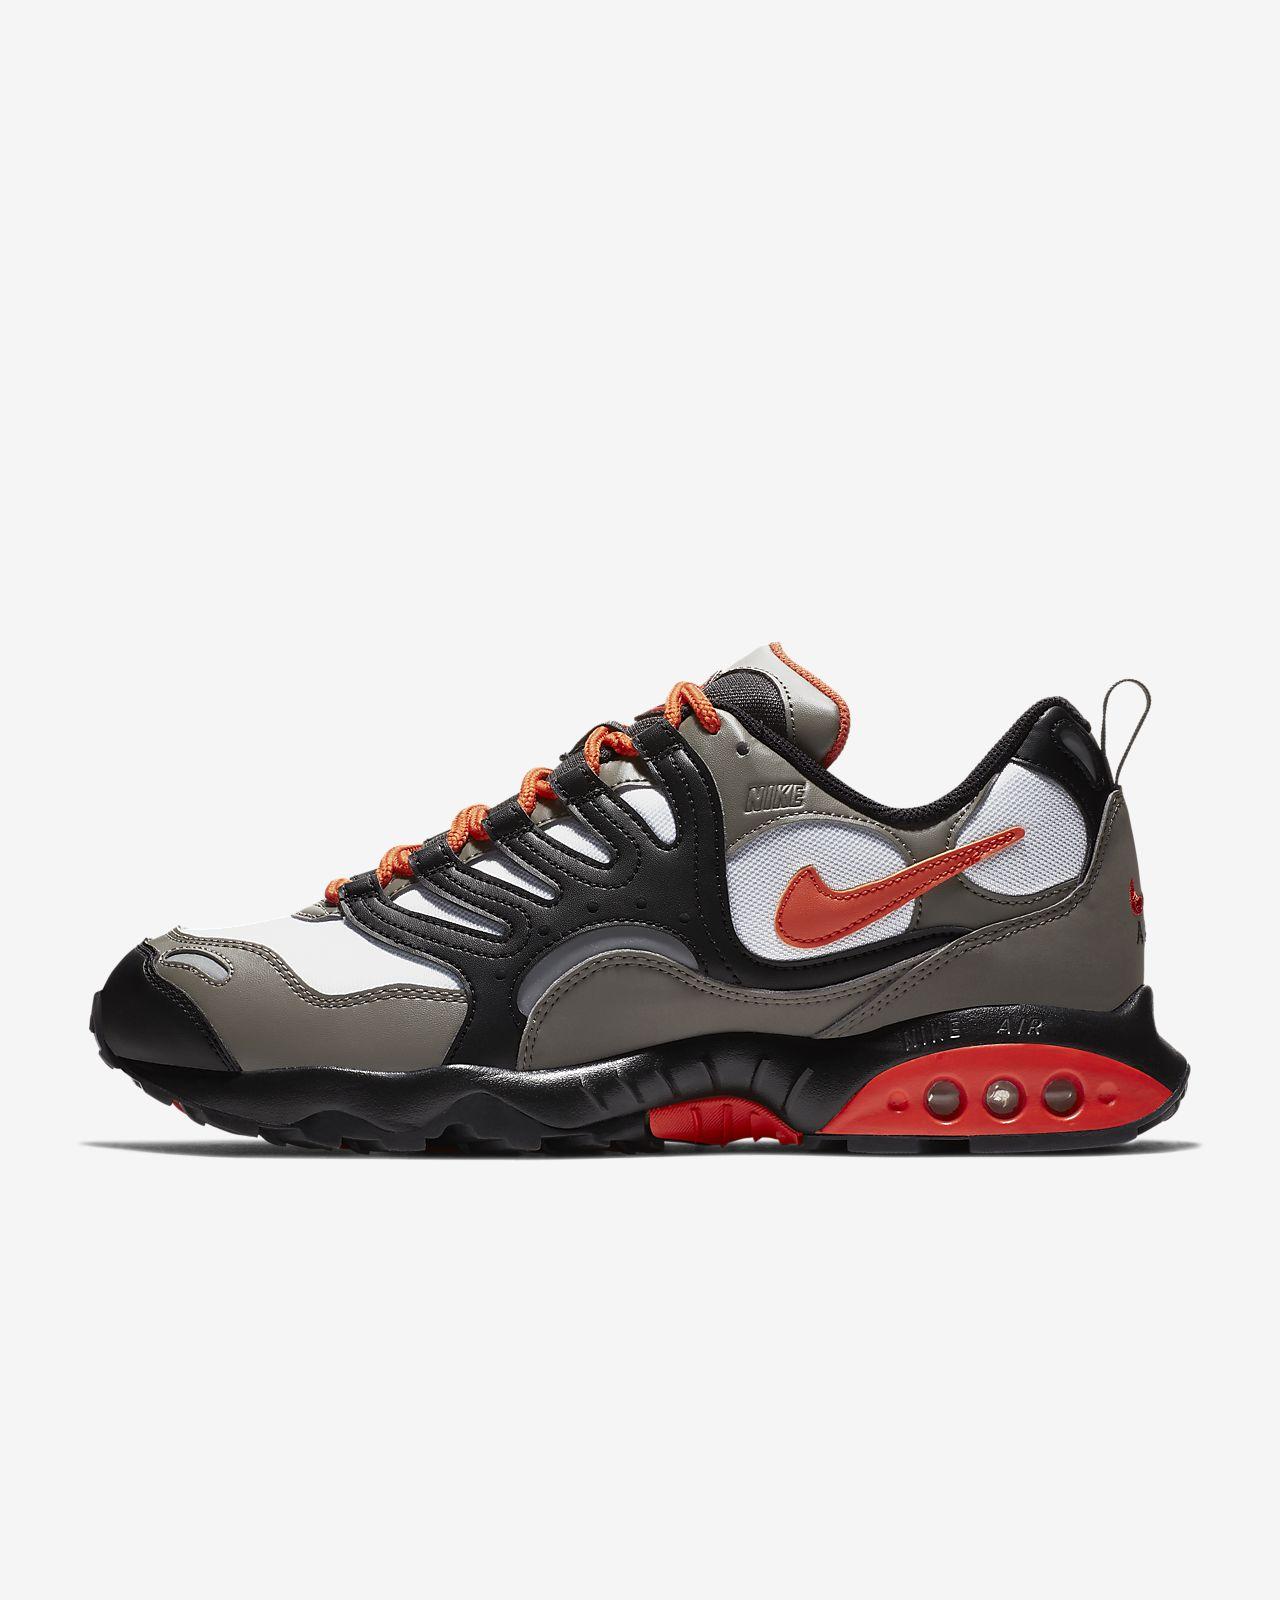 hot sale online afeac c521f Chaussure Nike Air Terra Humara 18 pour Homme